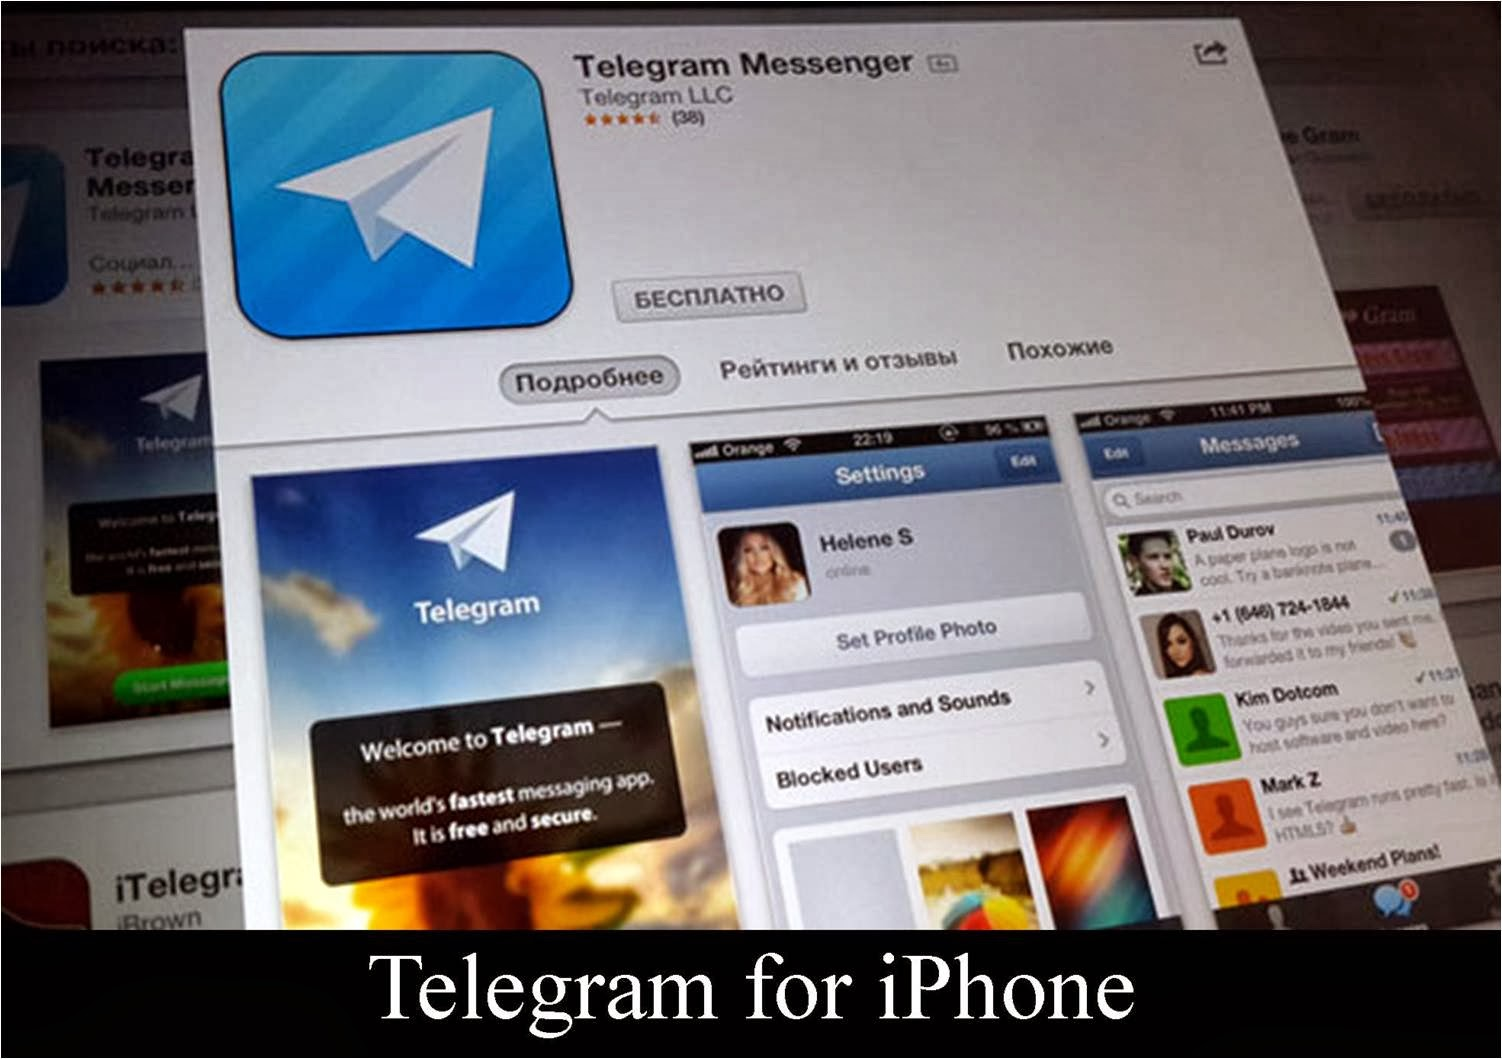 Telegram App on an iphone